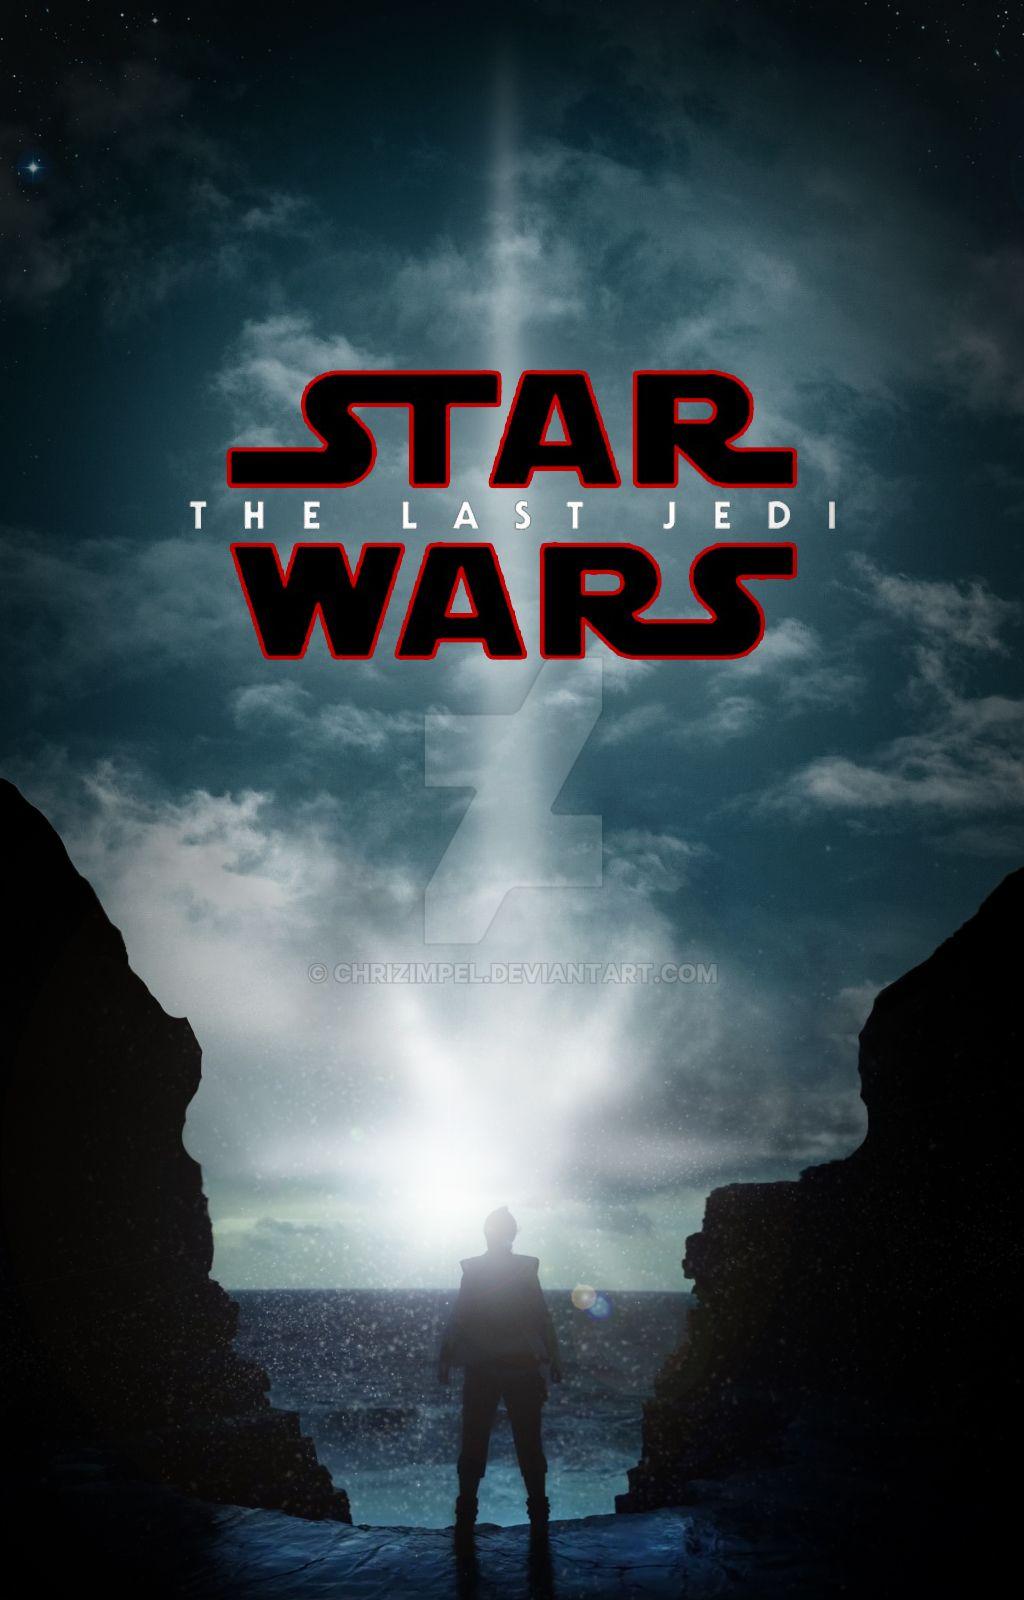 Star Wars The Last Jedi Wallpapers 34 Wallpapers Wallpapers For Desktop